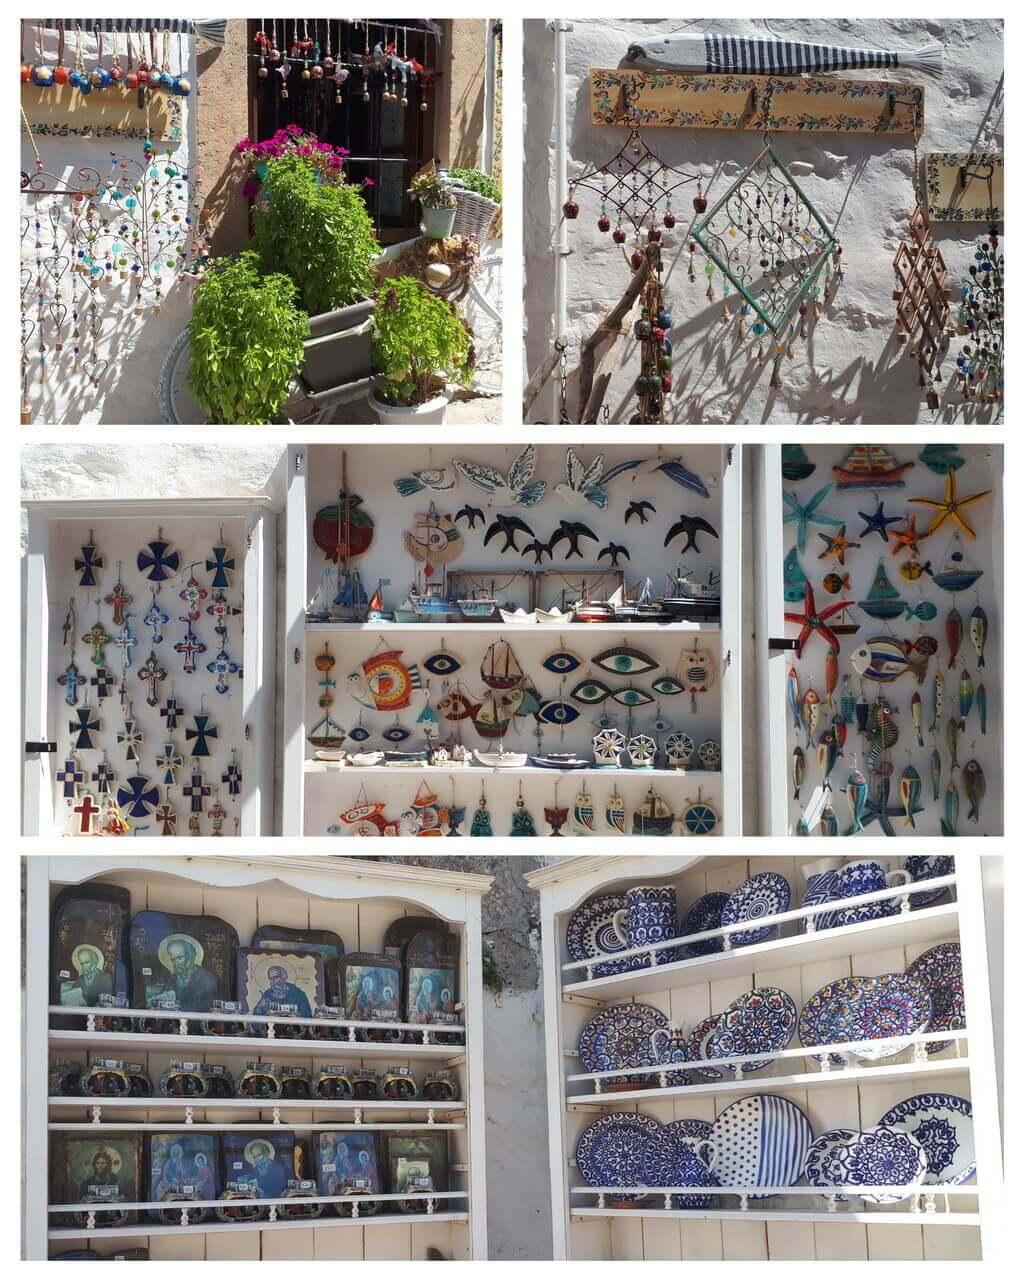 Chora, shops with souvenirs